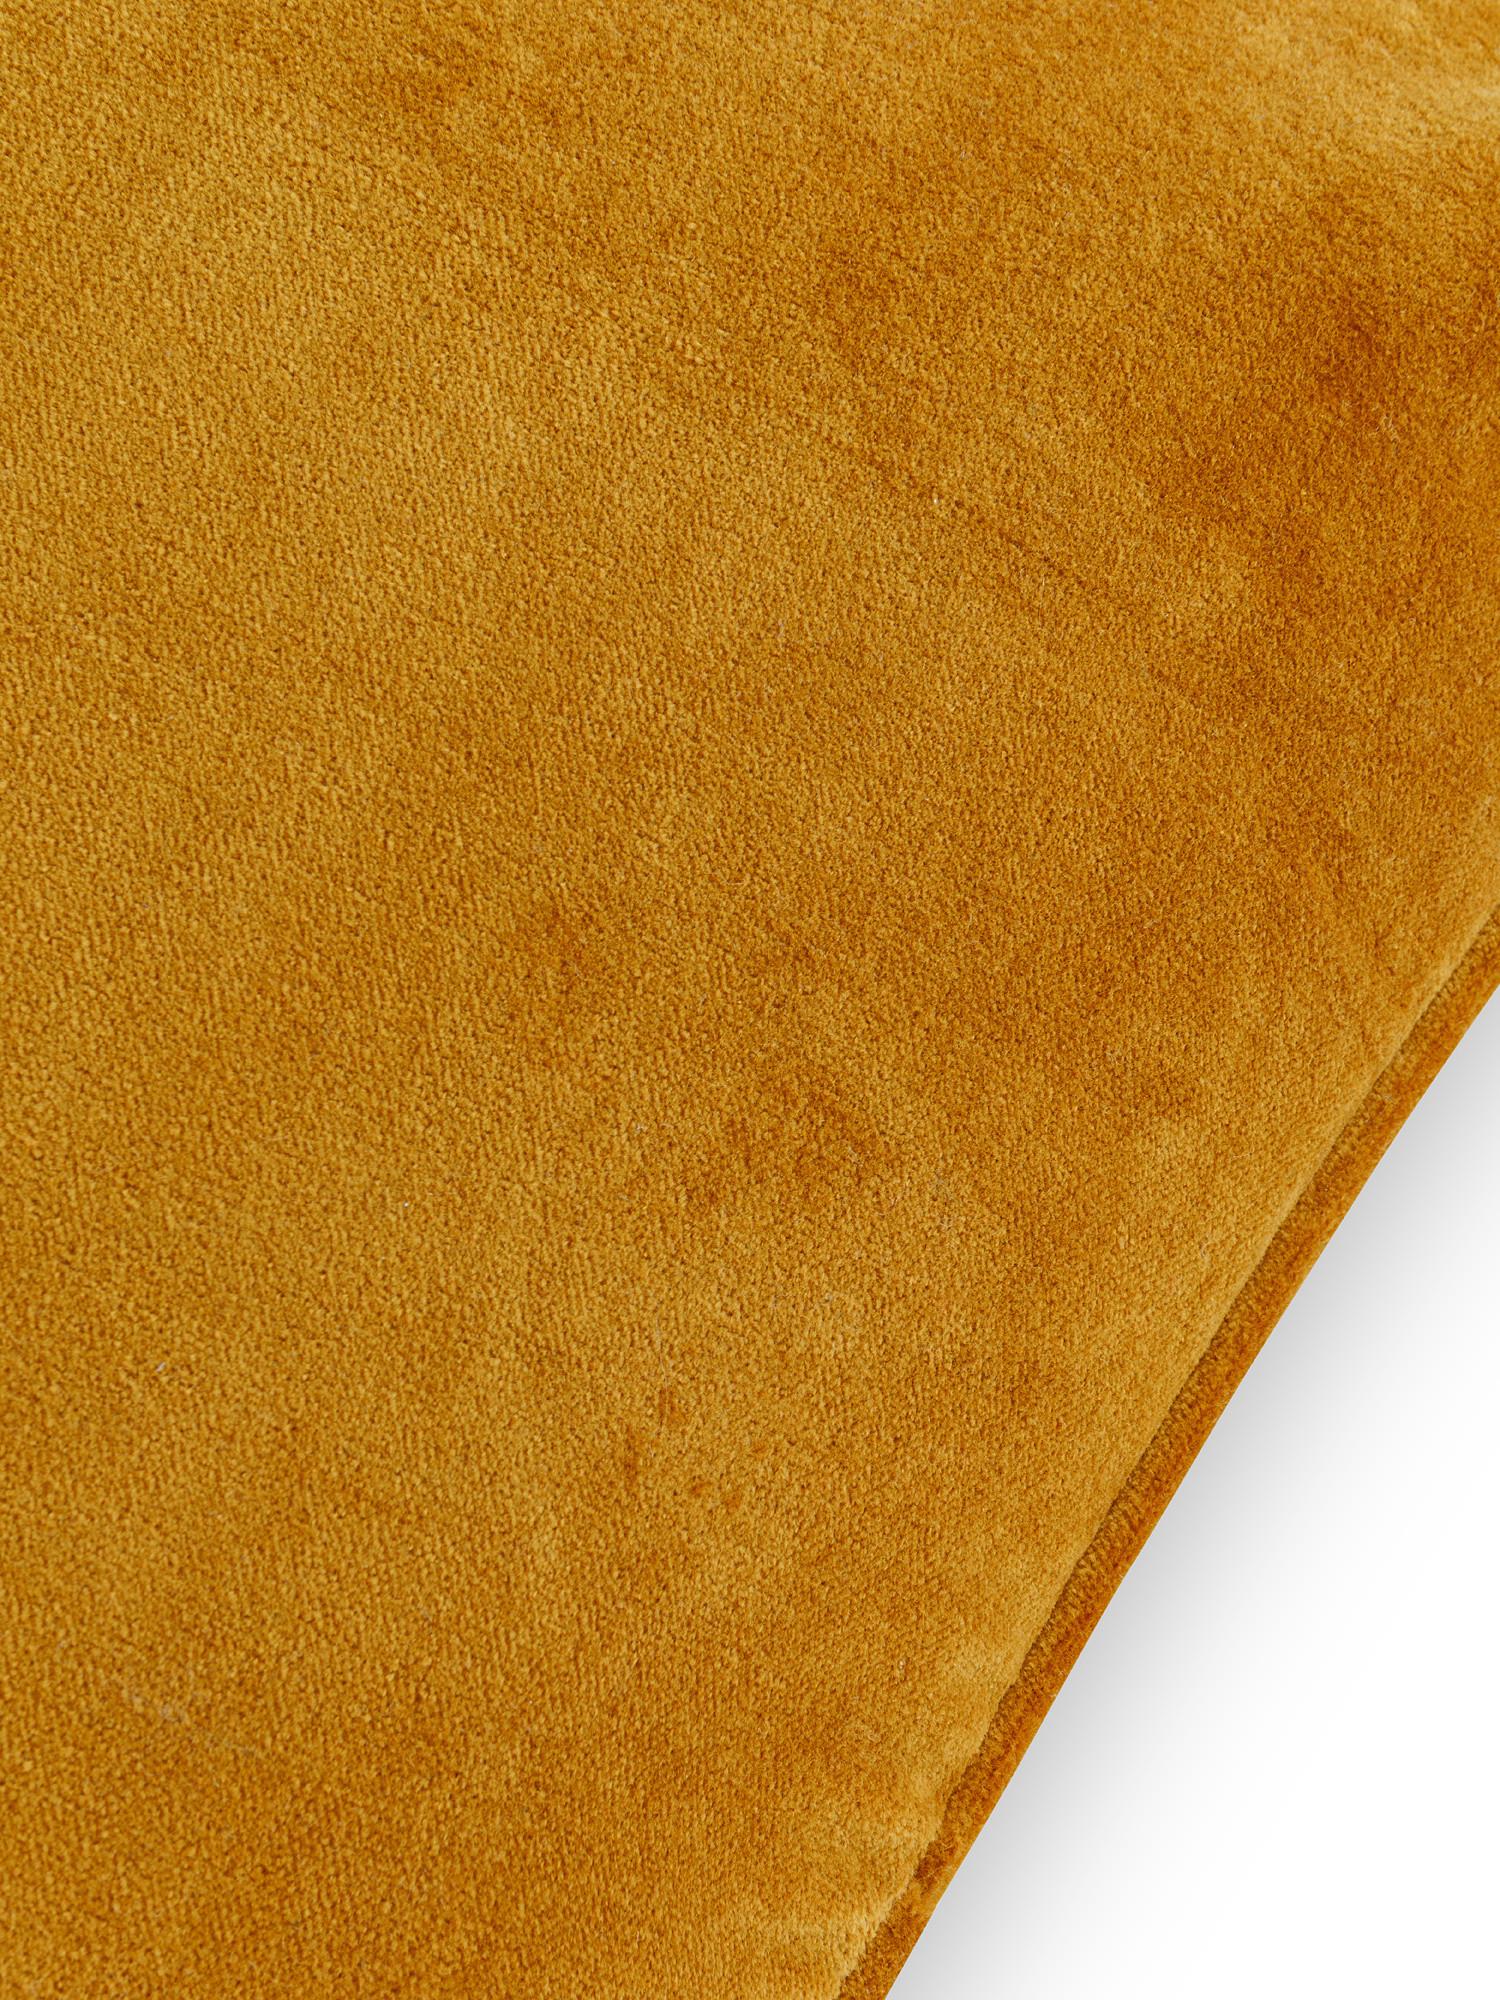 Cuscino velluto di cotone tinta unita 45x45cm, Giallo ocra, large image number 2